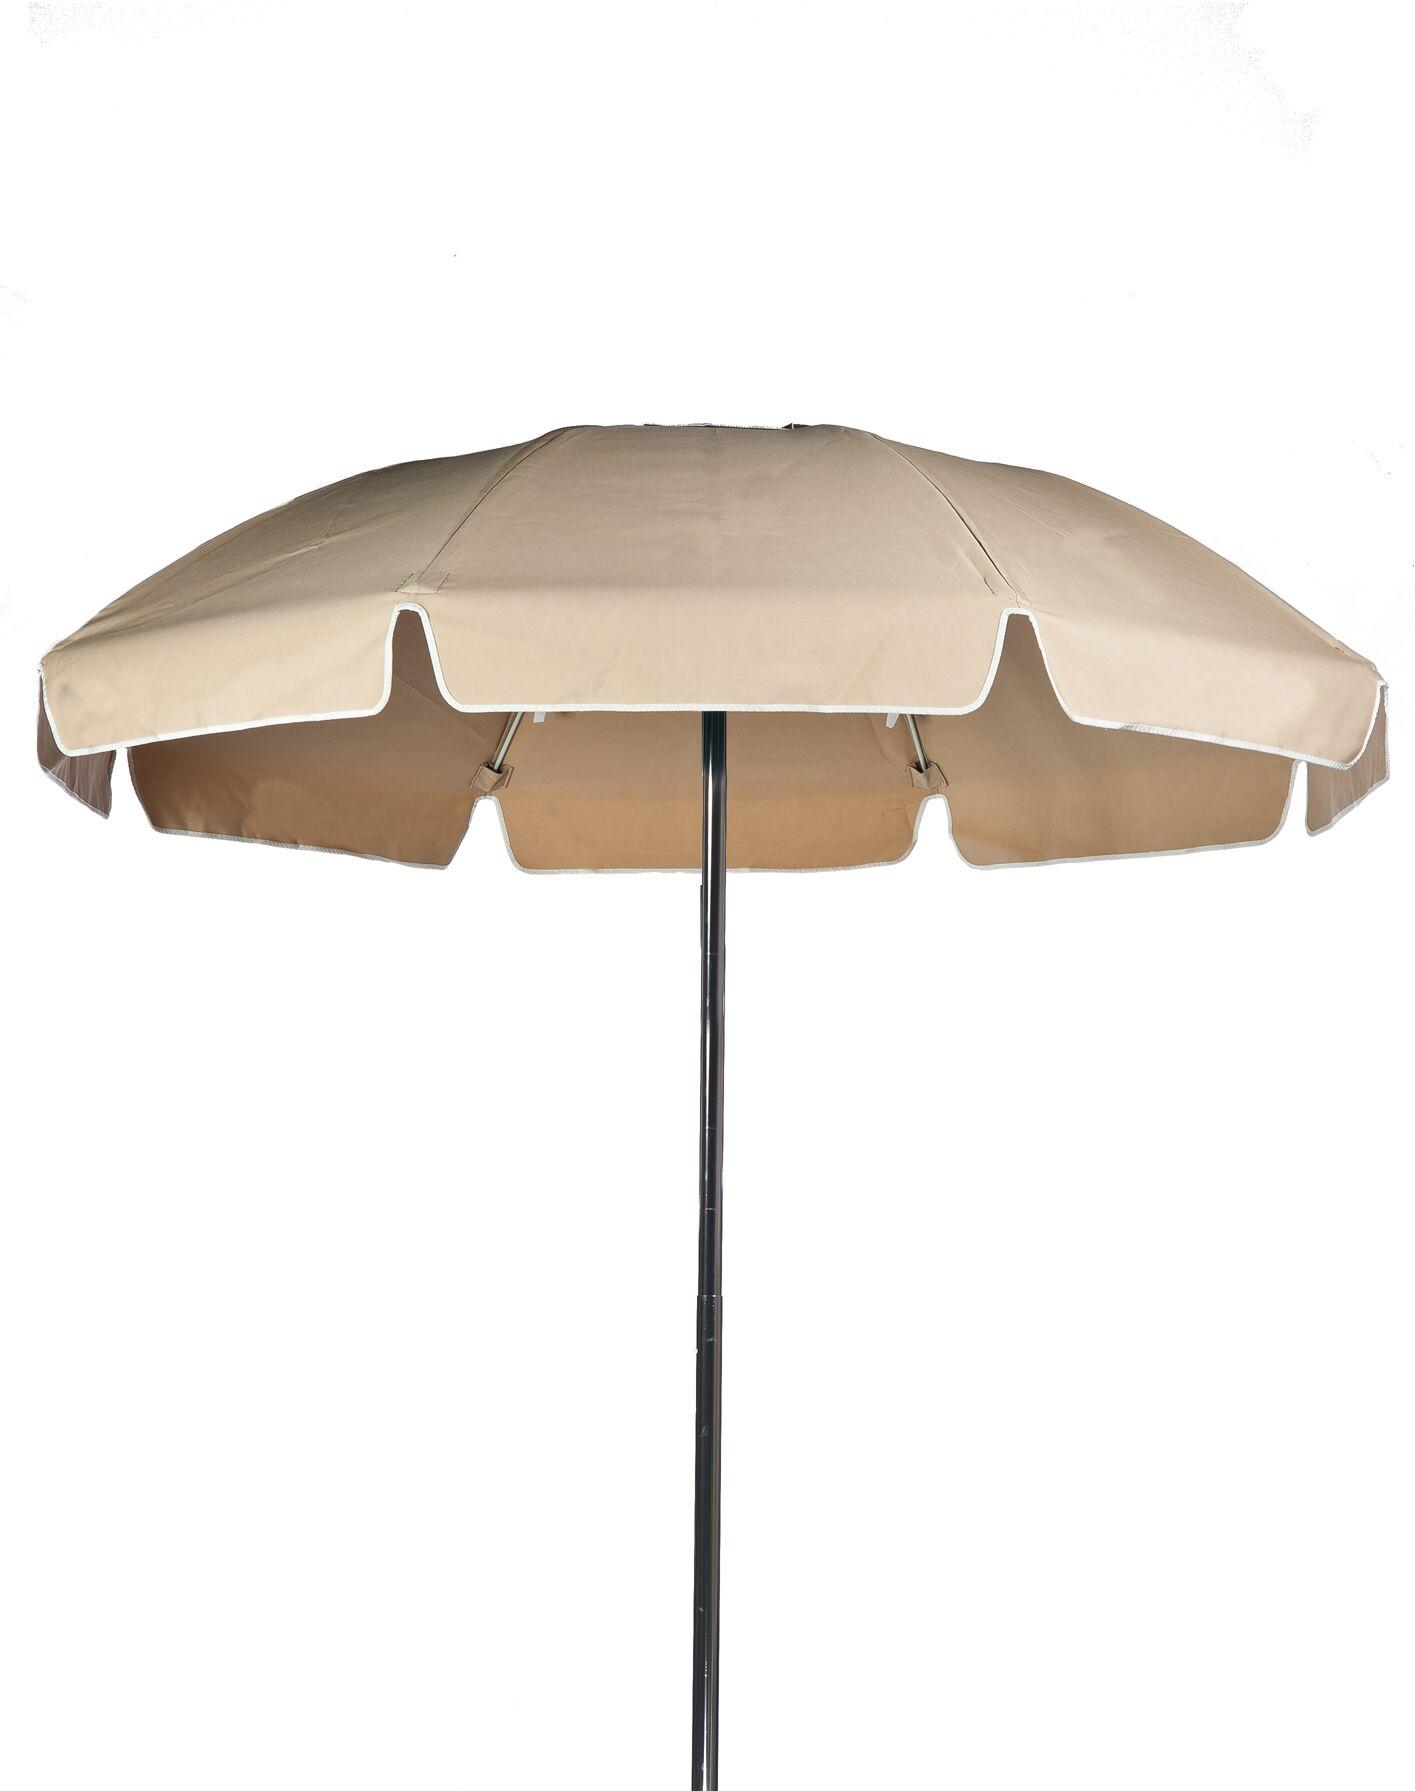 7.5' Drape Umbrella Color: Toast, Vent: Yes